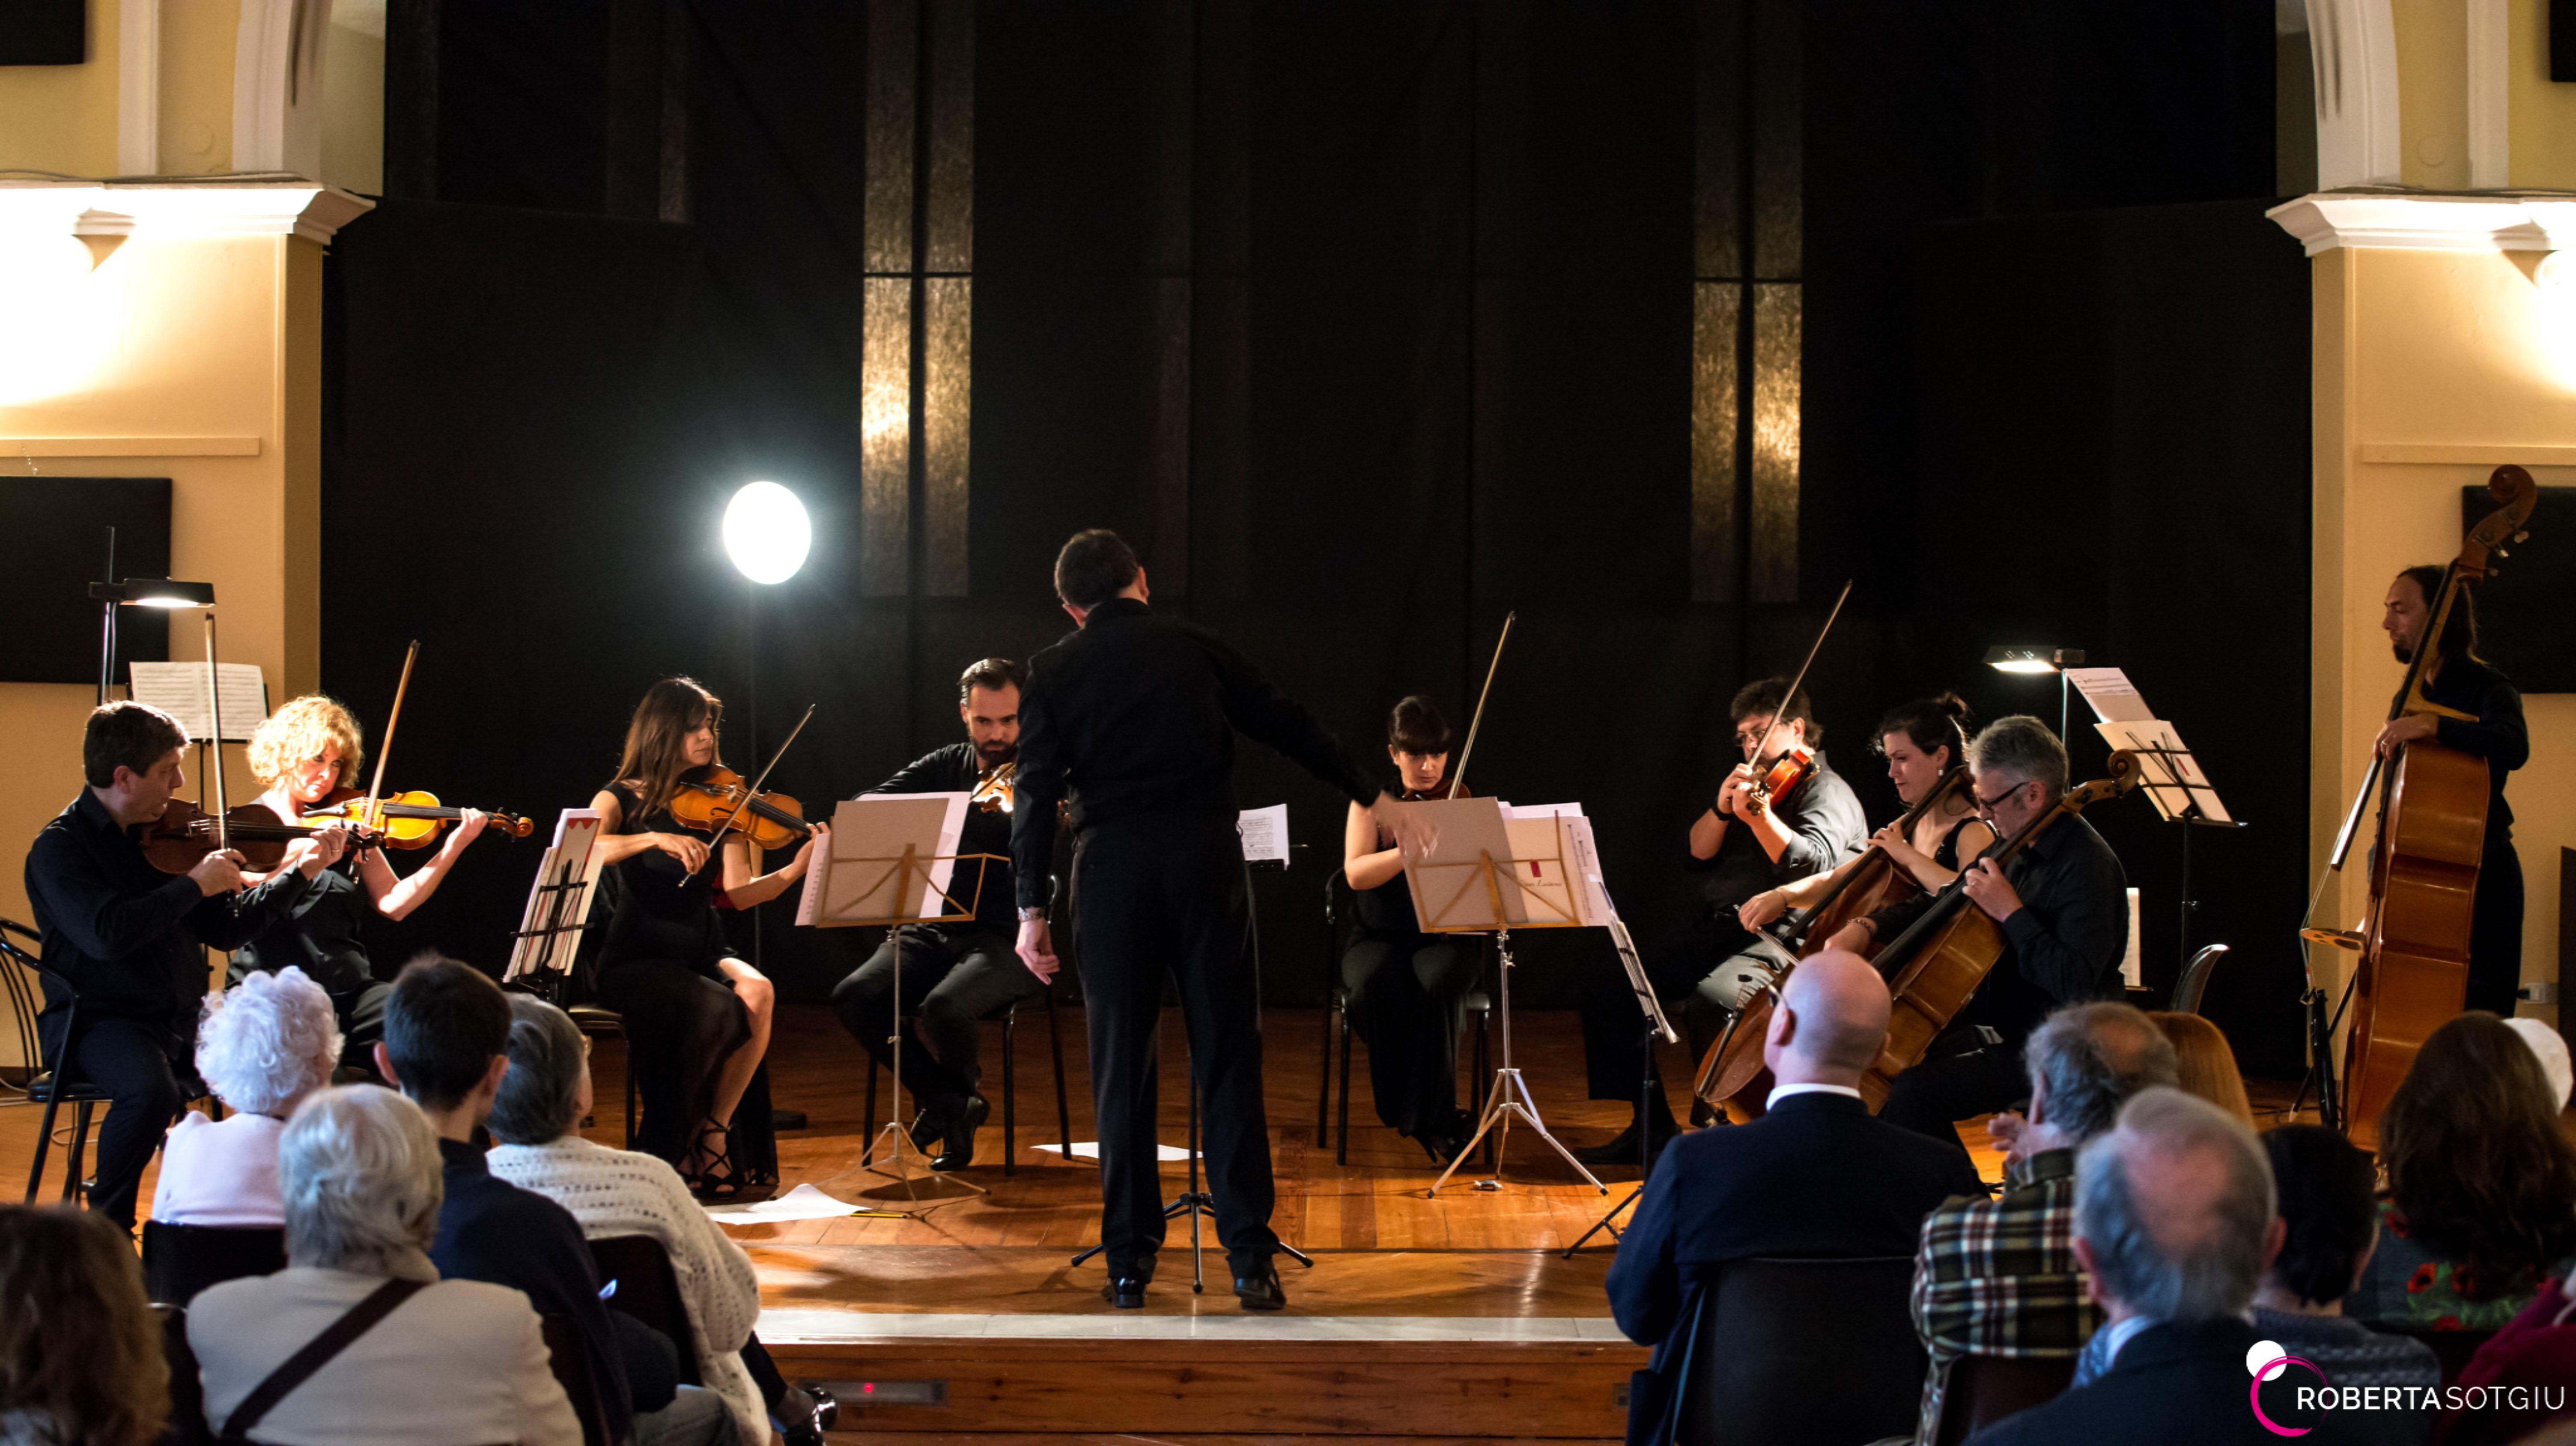 I Solisti Laudensi – 29 aprile 2018 – Villa Durio, Varallo Sesia (VC)